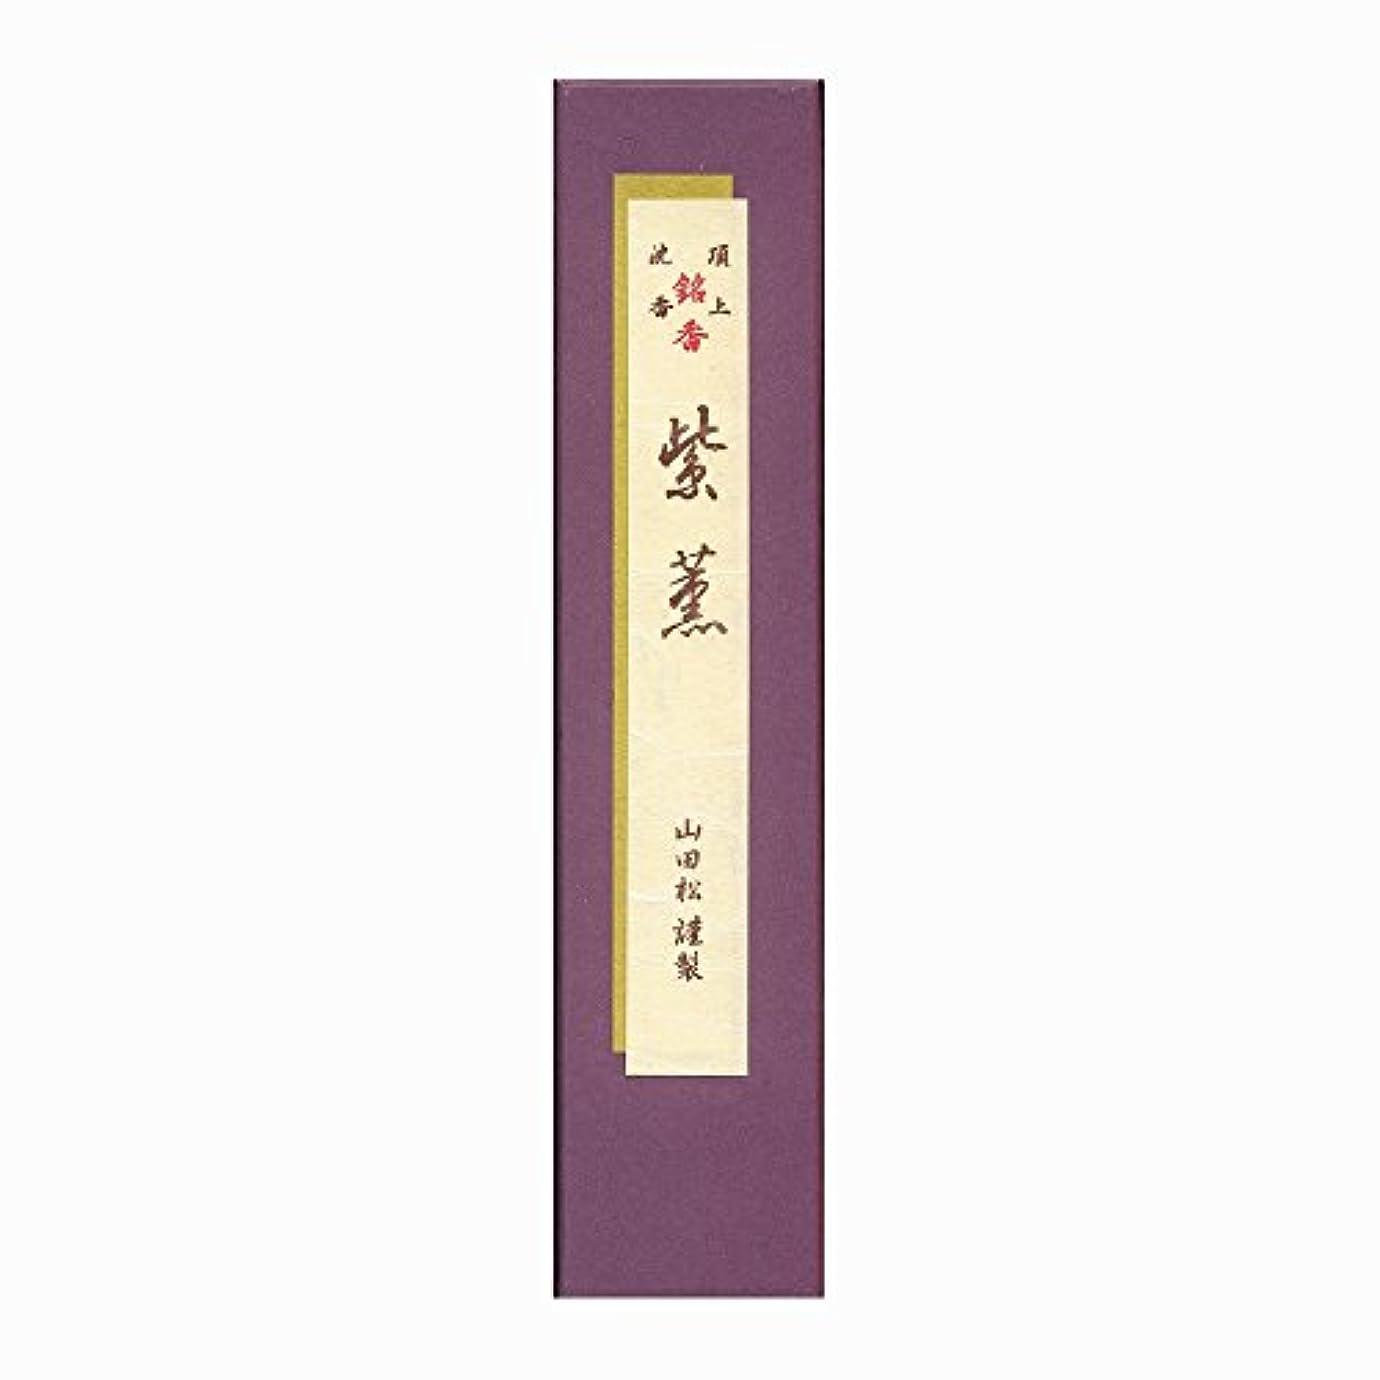 感情通訳シャンプー紫薫 短寸(5寸) 紙箱入